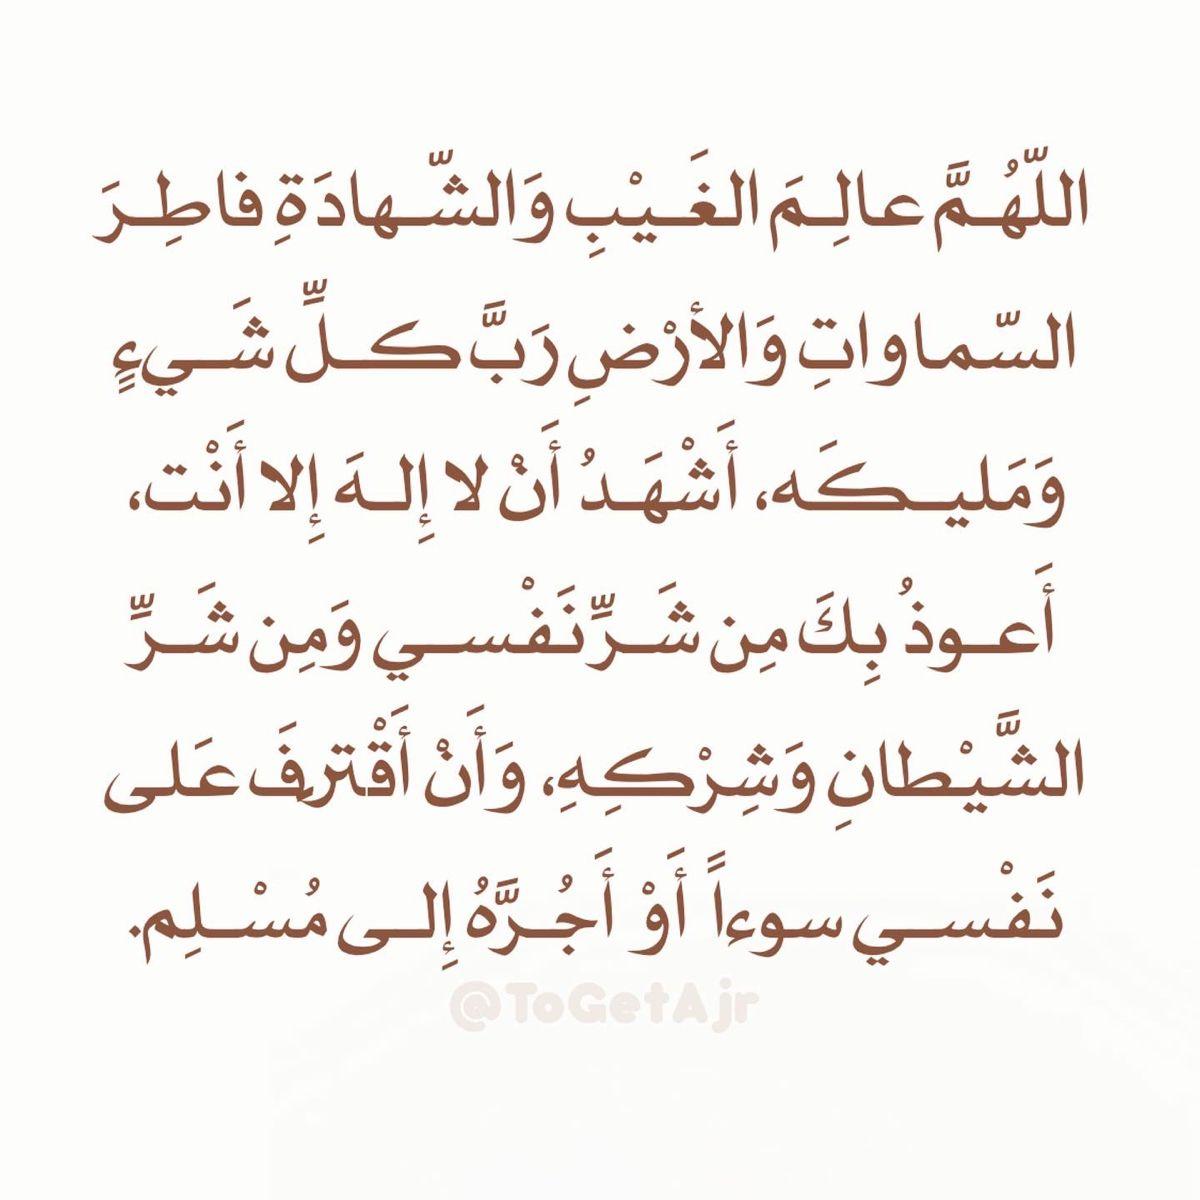 اذكار الصباح ١١ Math Arabic Calligraphy Calligraphy